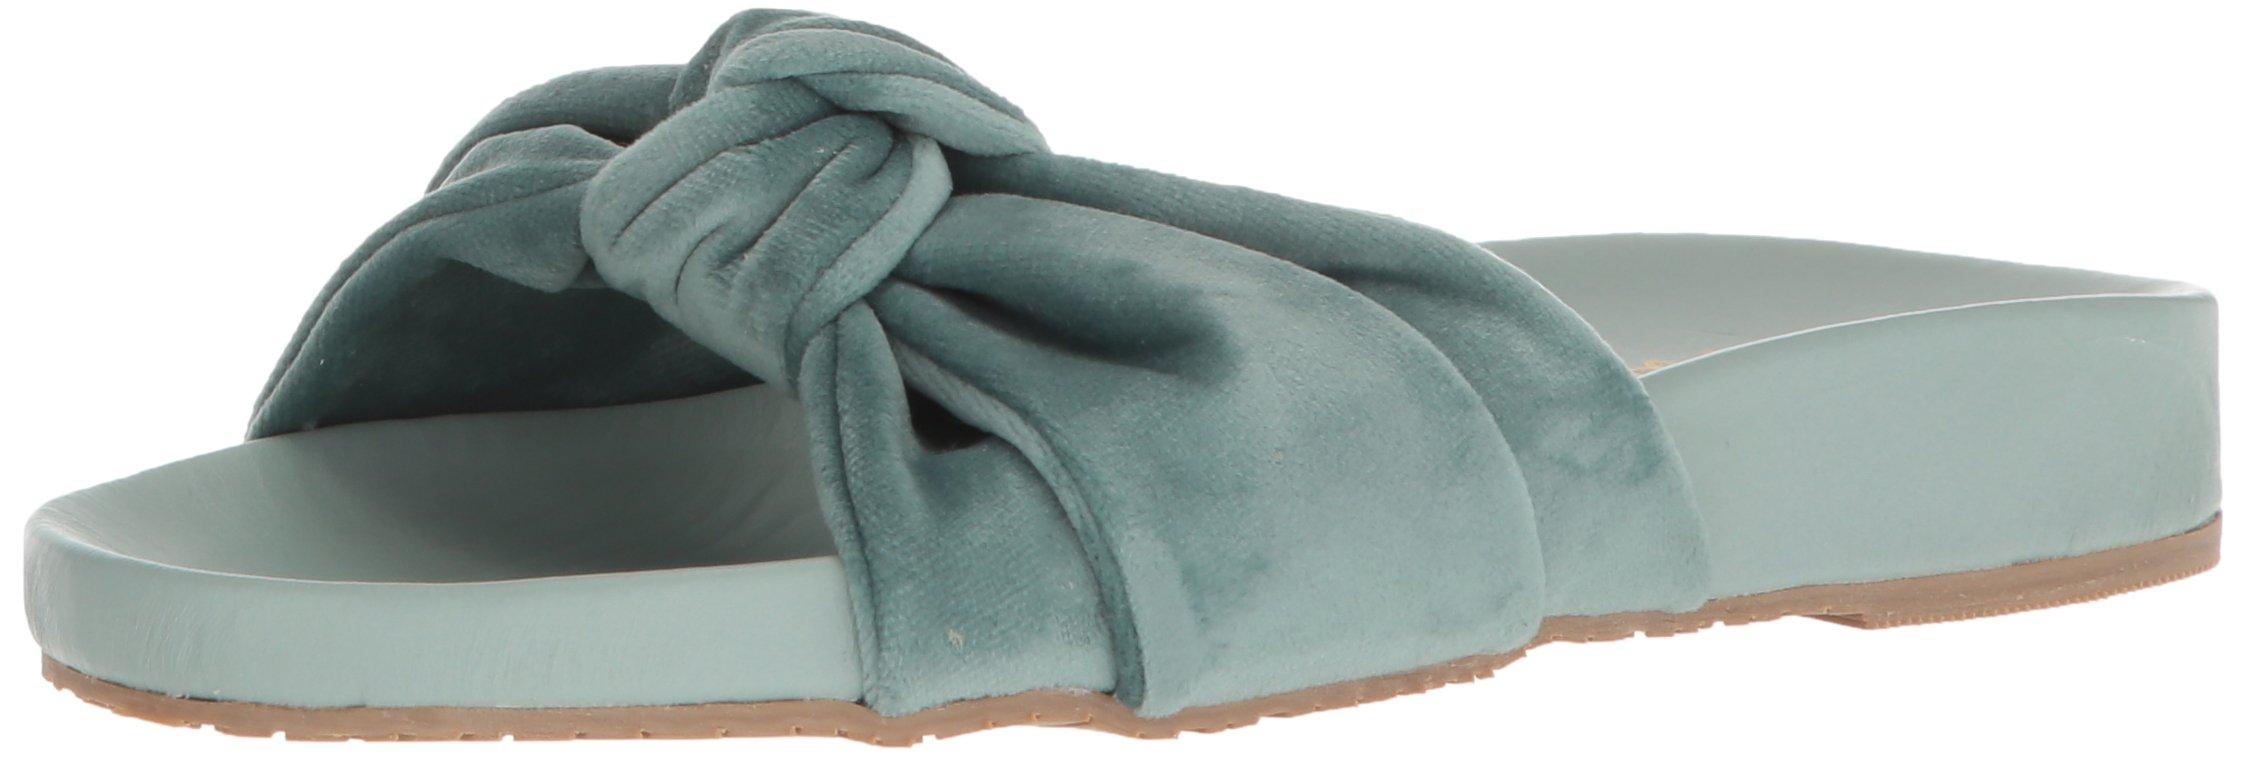 KAANAS Women's Santa Rosa Twist Turban Pool Shoe Slide Sandal, Mint, 10 M US